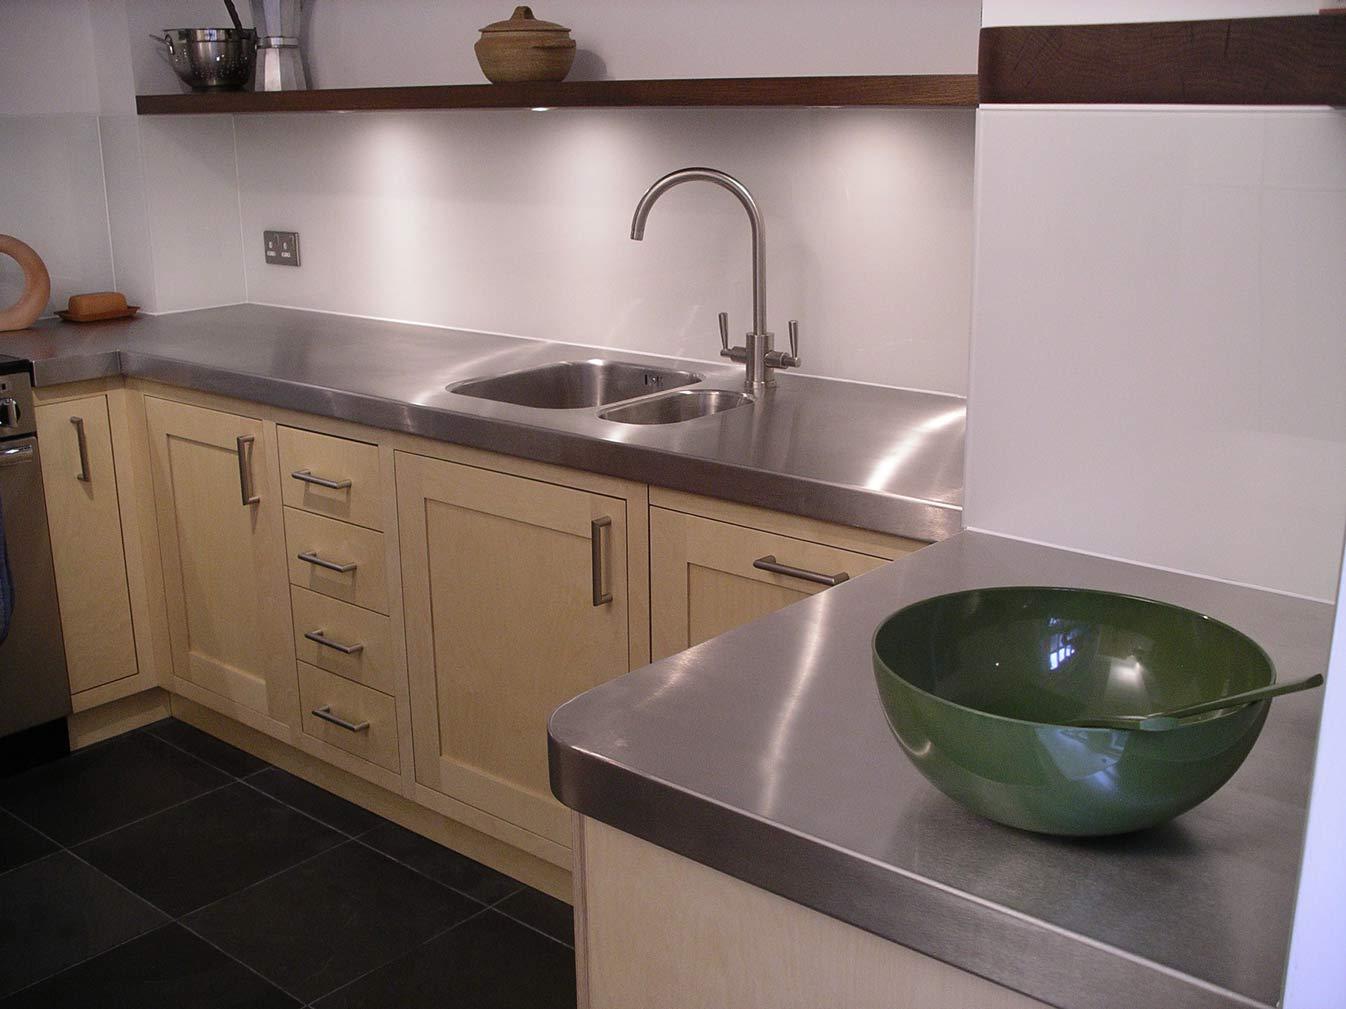 Stainless steel kitchen work surfaces - Handmade Kitchen With Bespoke Stainless Steel Worktops